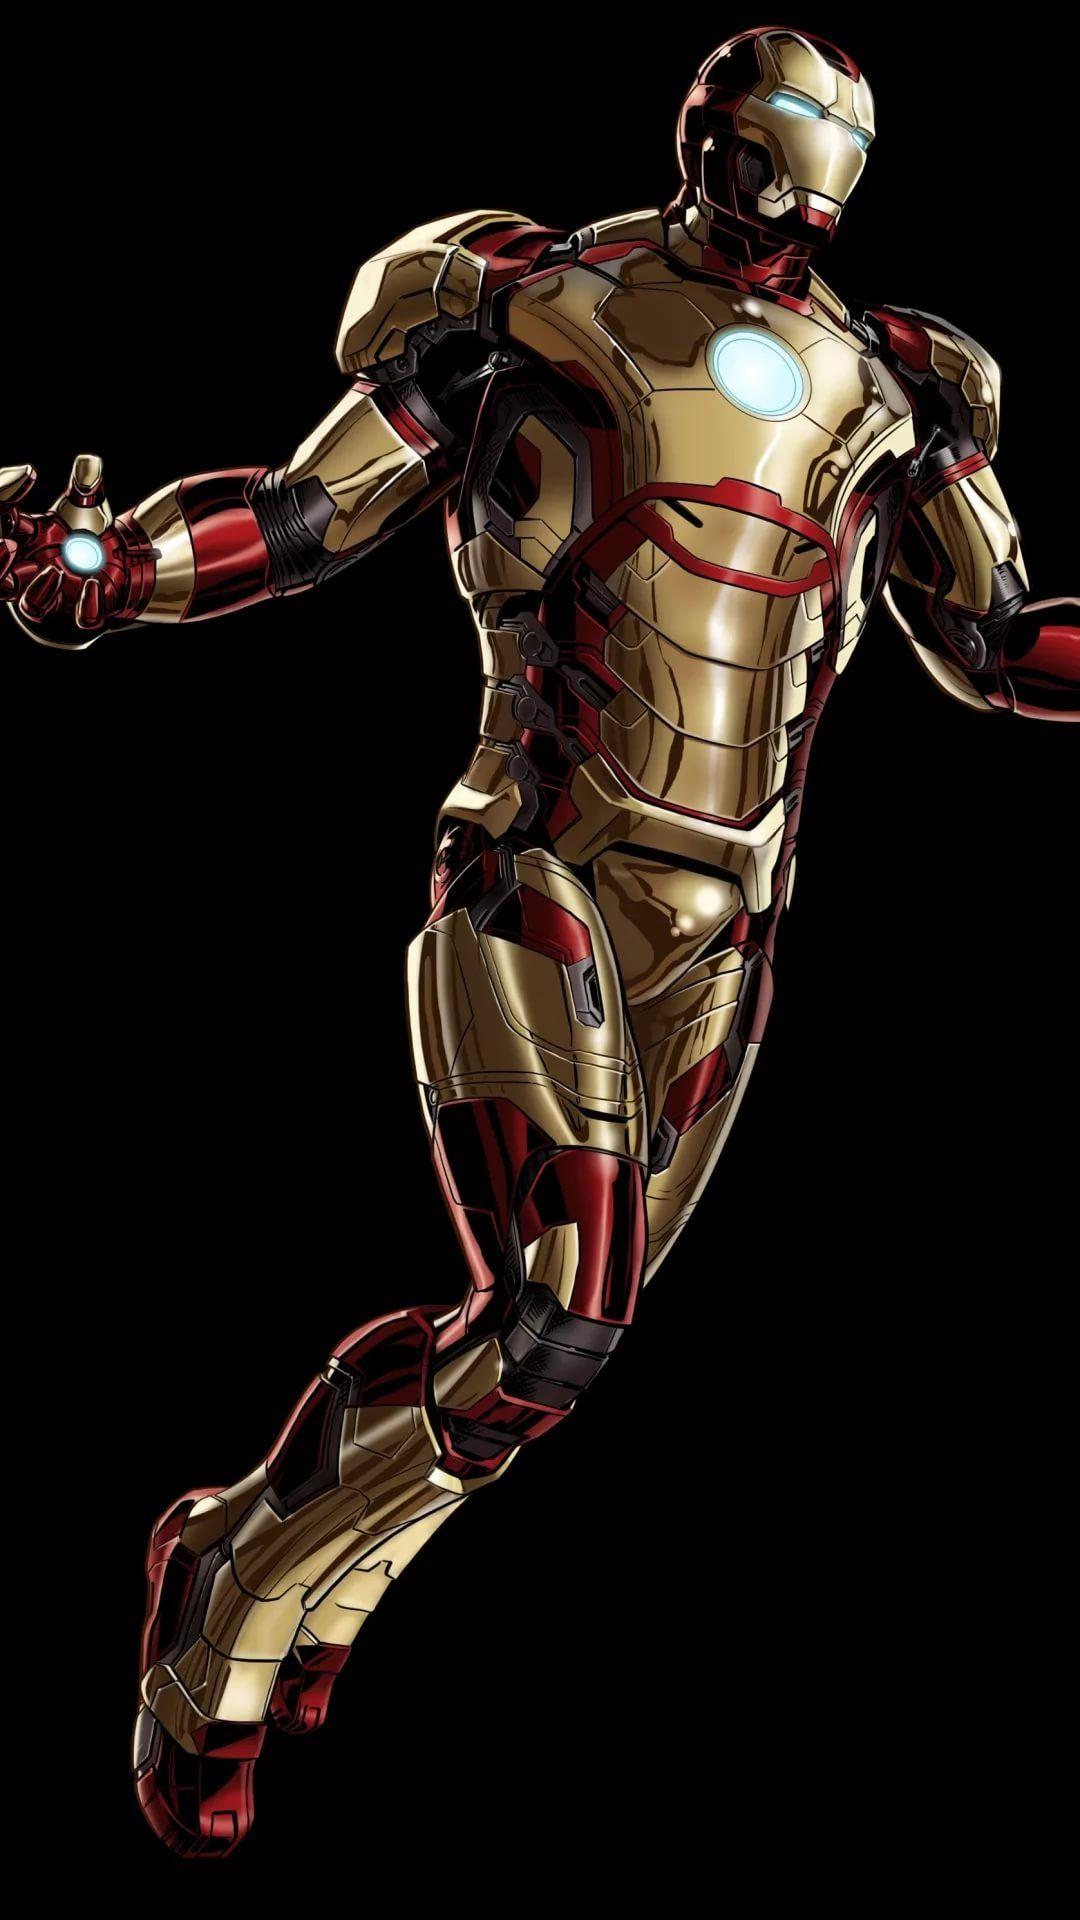 Iron Man D iOS 7 wallpaper